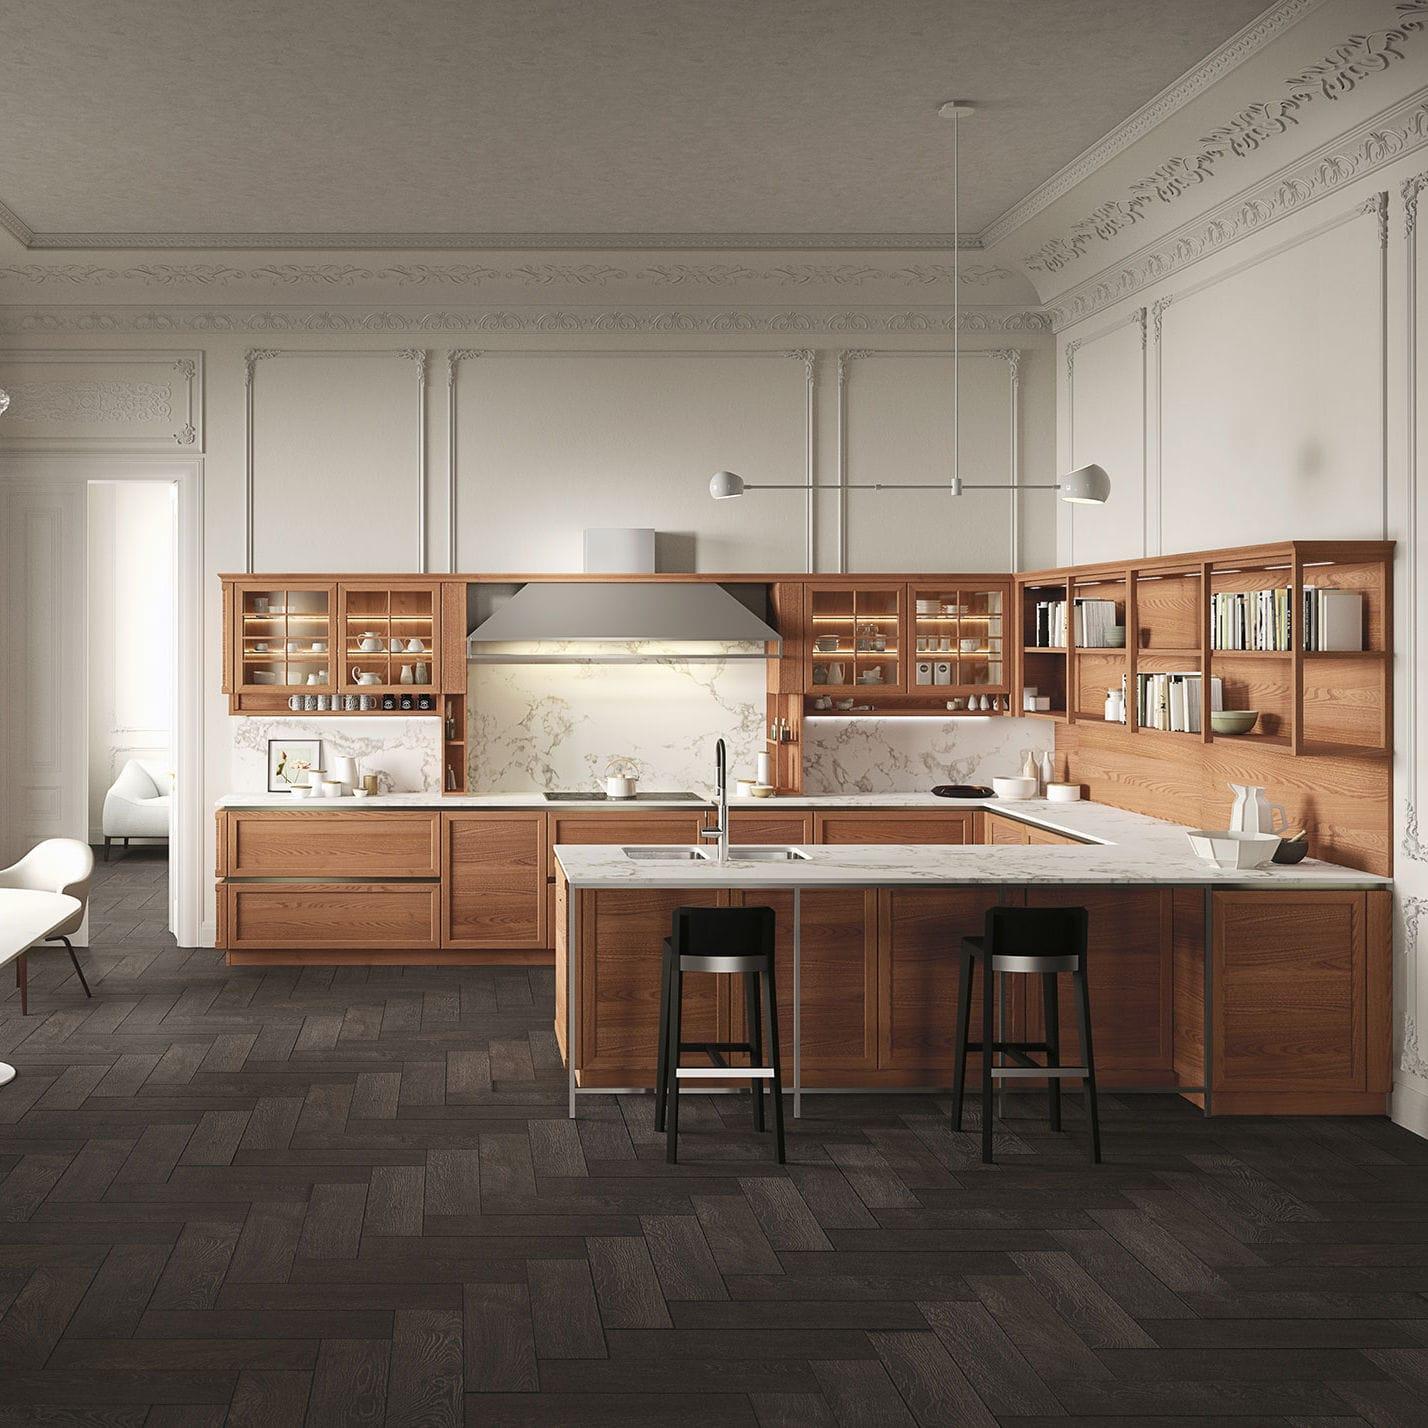 Cucina classica / in olmo / modulare / con isola - HERITAGE by Iosa ...